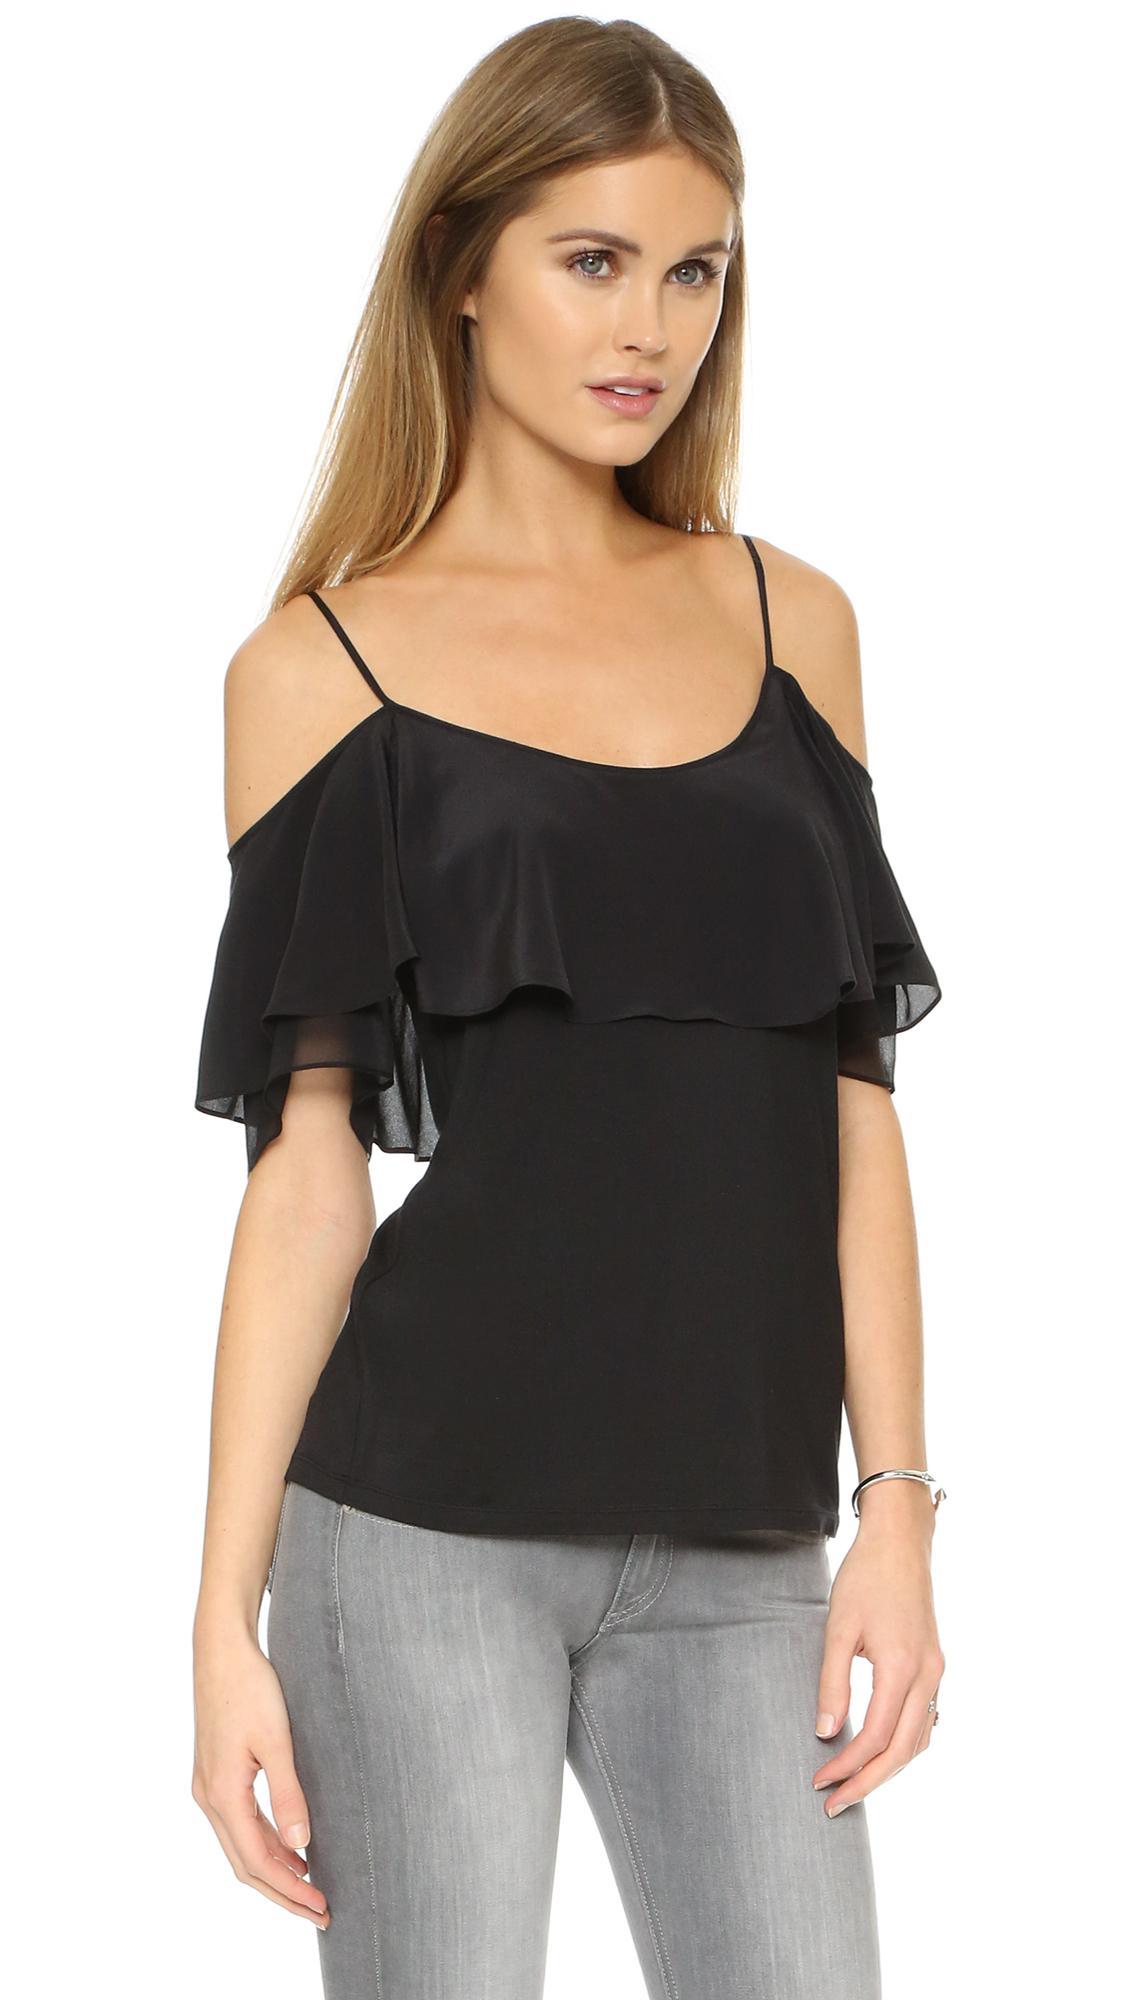 928a690eee41 Lyst - Ella Moss Bella Off Shoulder Blouse in Black